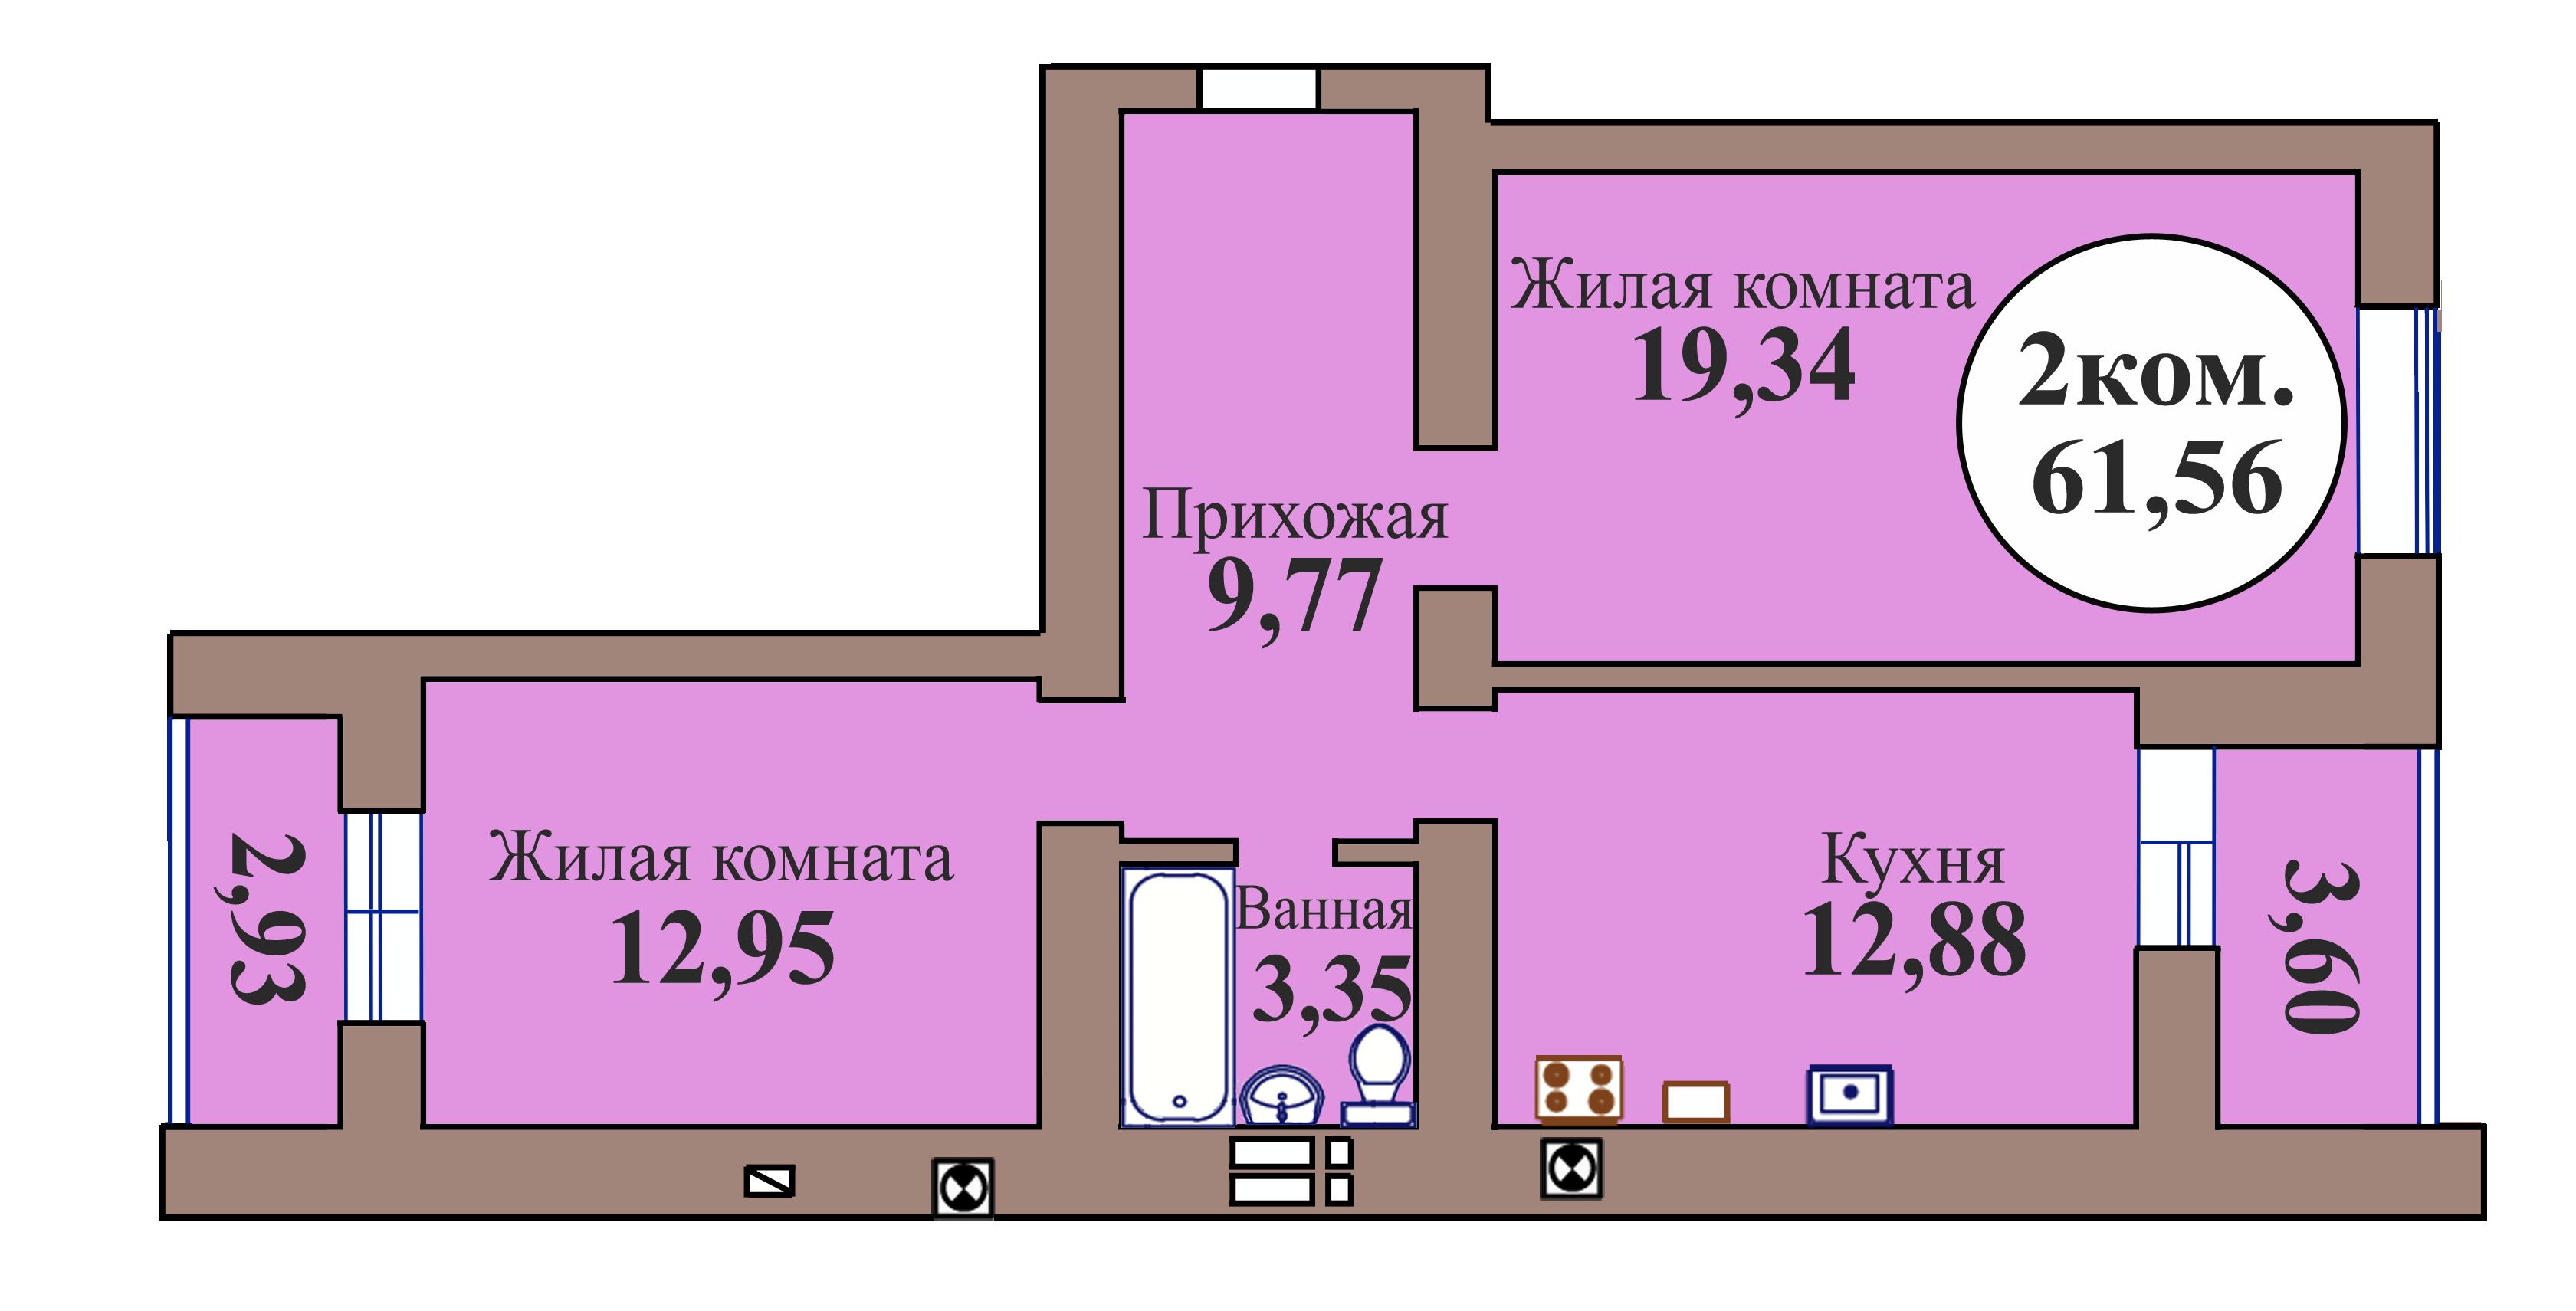 2-комн. кв. по пер. Калининградский, 5 кв. 137 в Калининграде